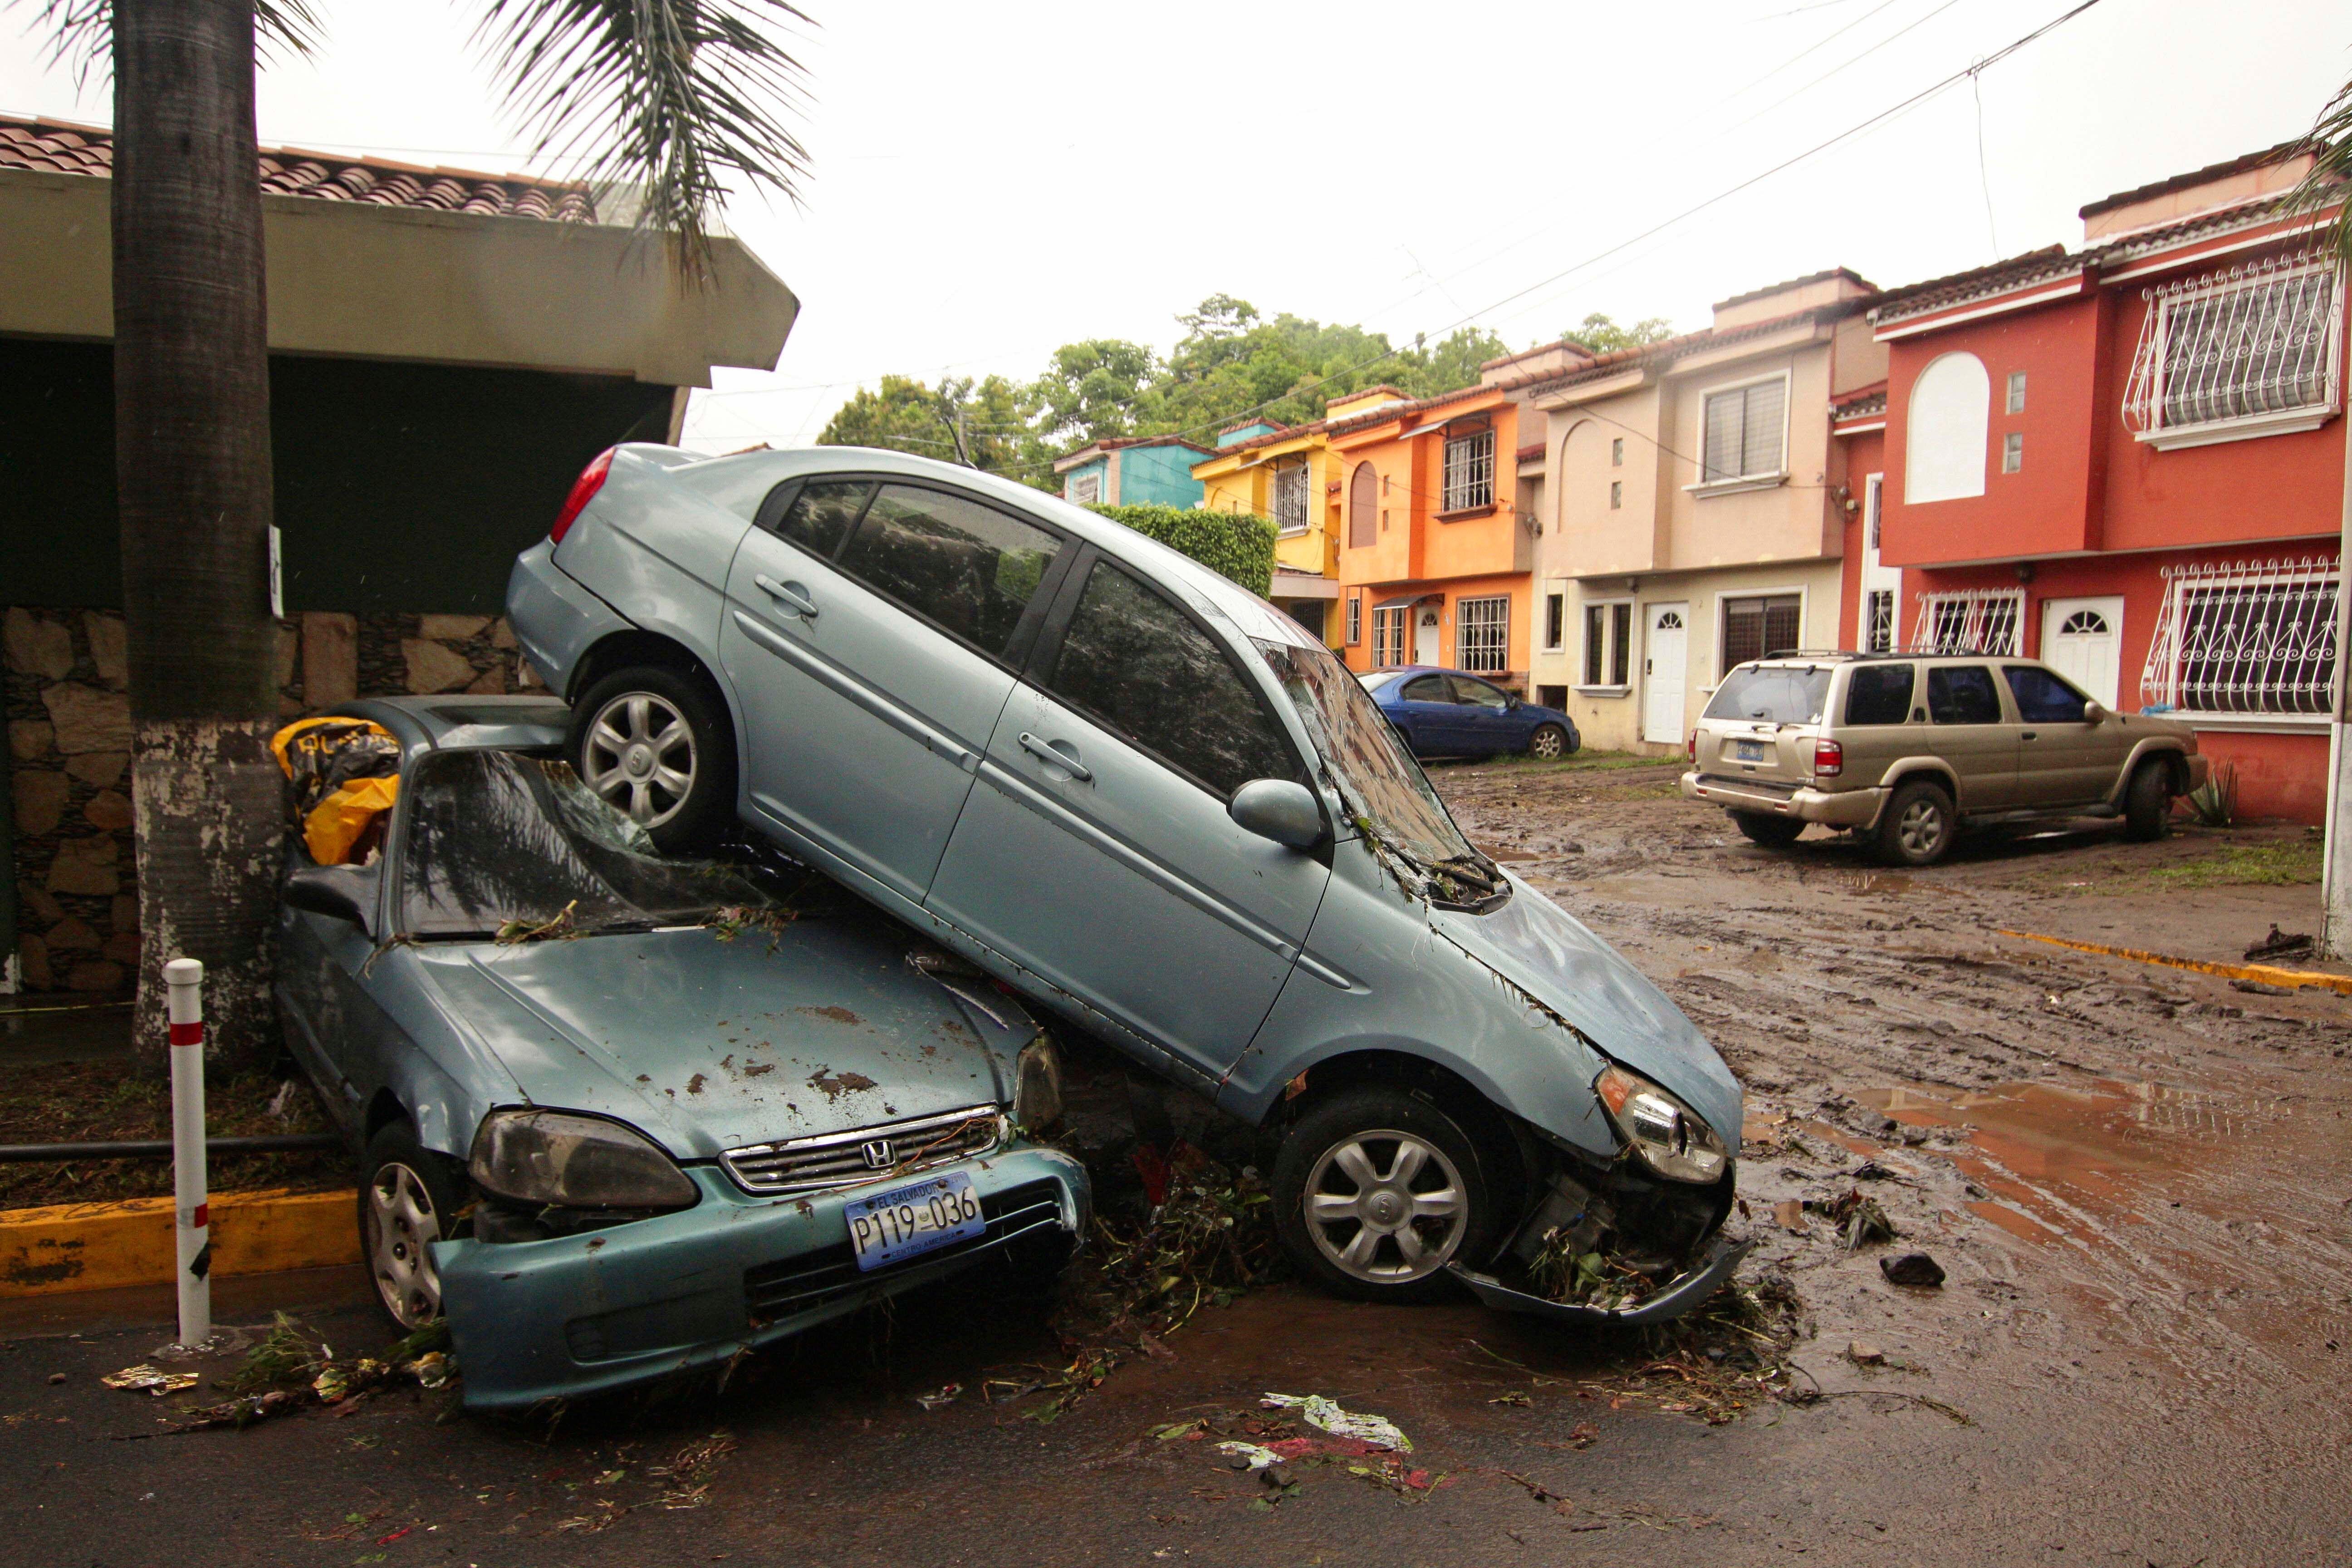 Beginn der Hurrikansaison: 14 Tote bei Tropensturm in El Salvador